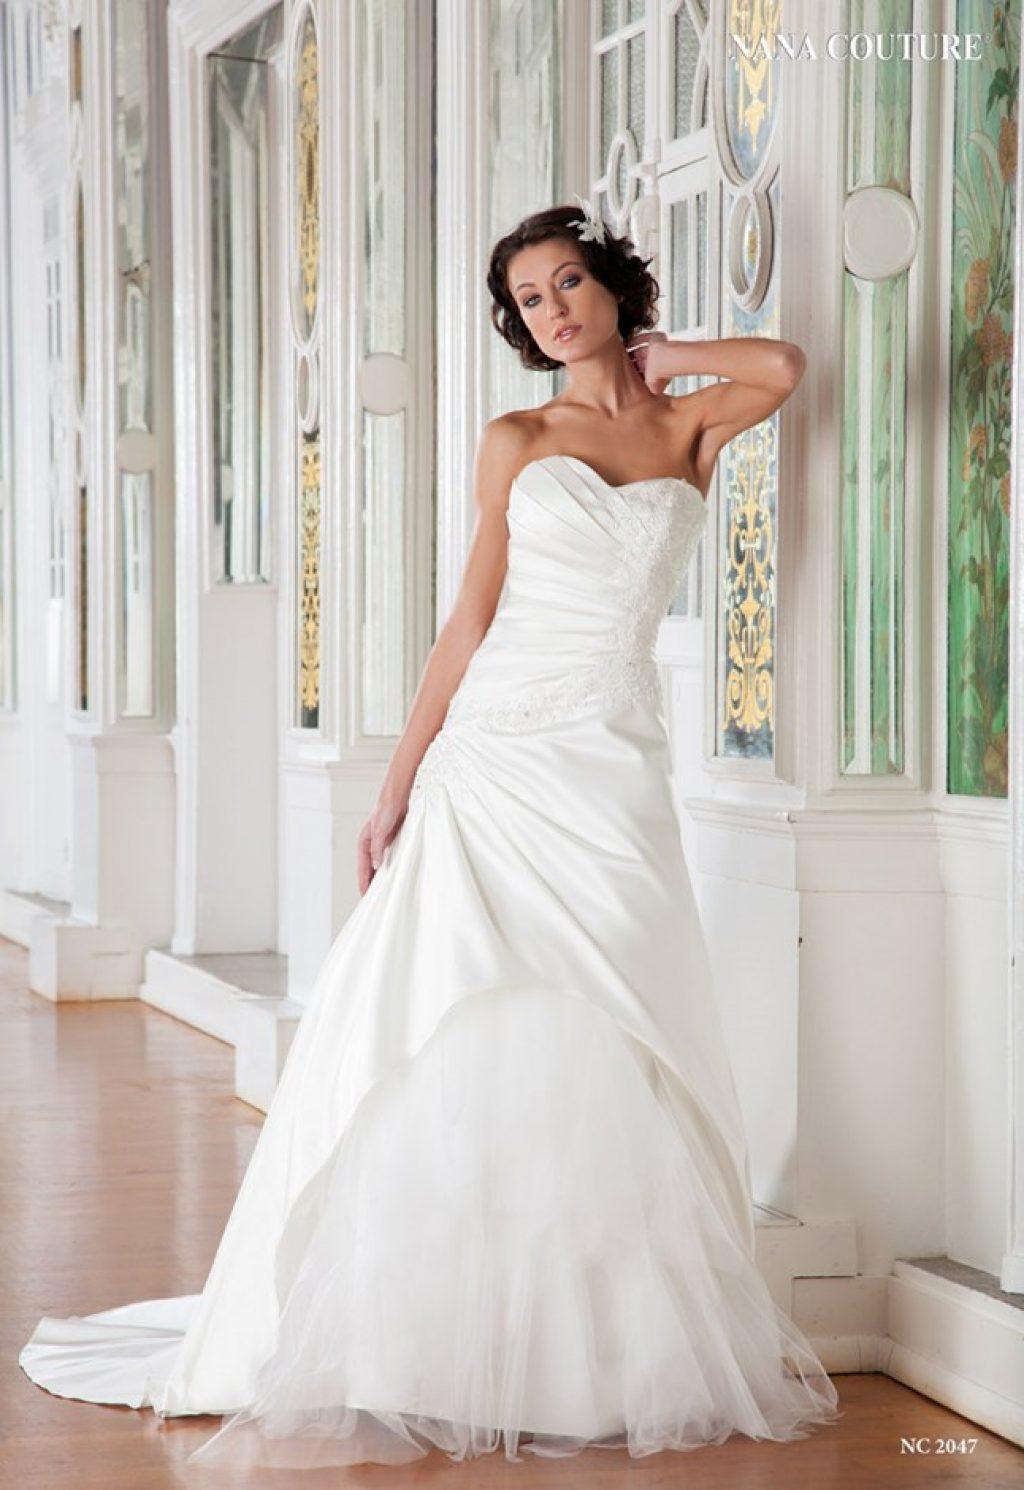 Prix robe de mariee nana couture